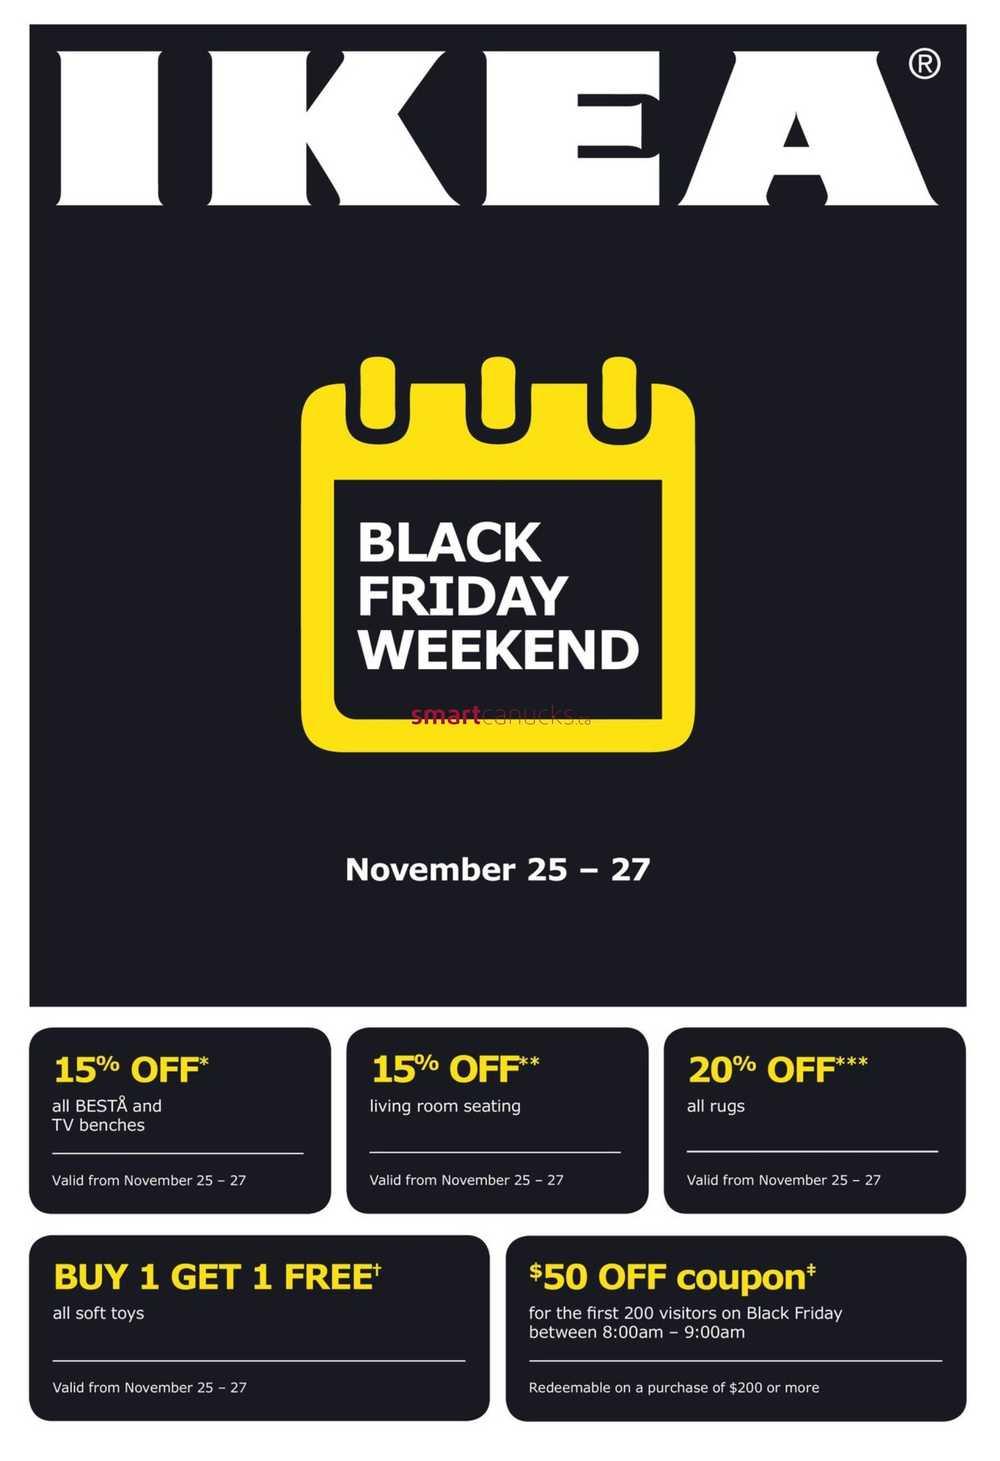 Ikea Black Friday Weekend Flyer November 25 To 27